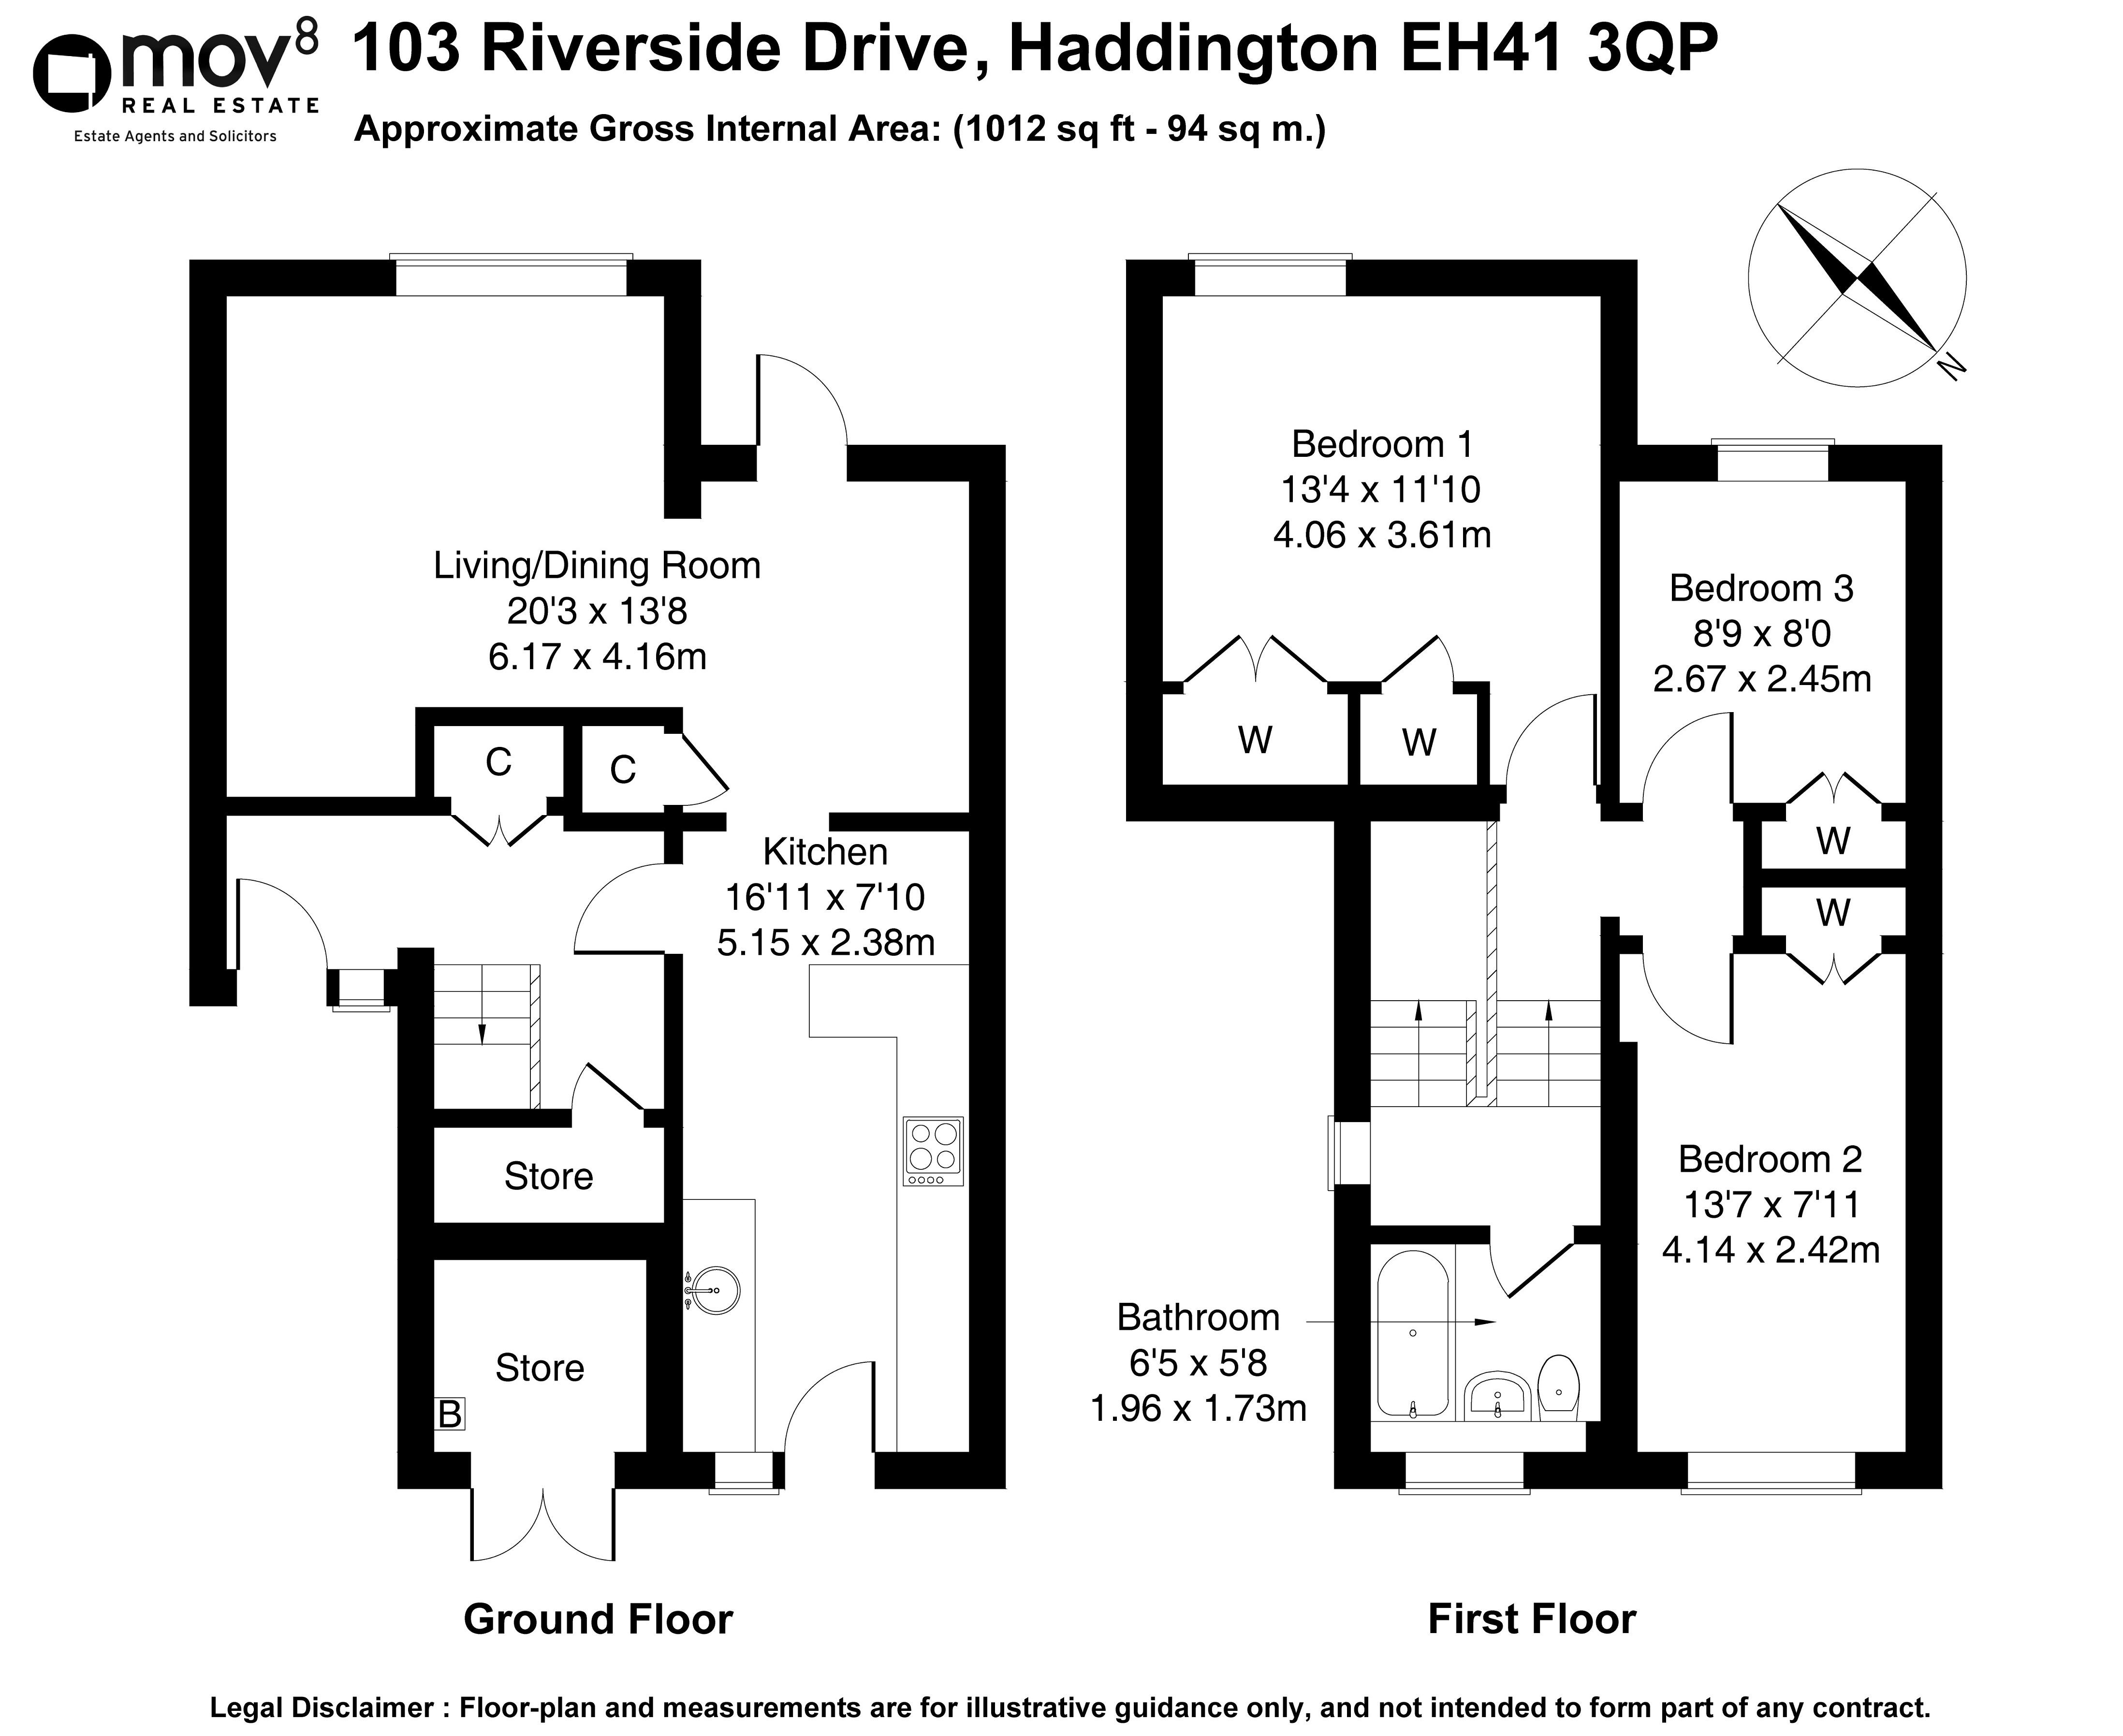 Floorplan 1 of 103 Riverside Drive, Haddington, East Lothian, EH41 3QP